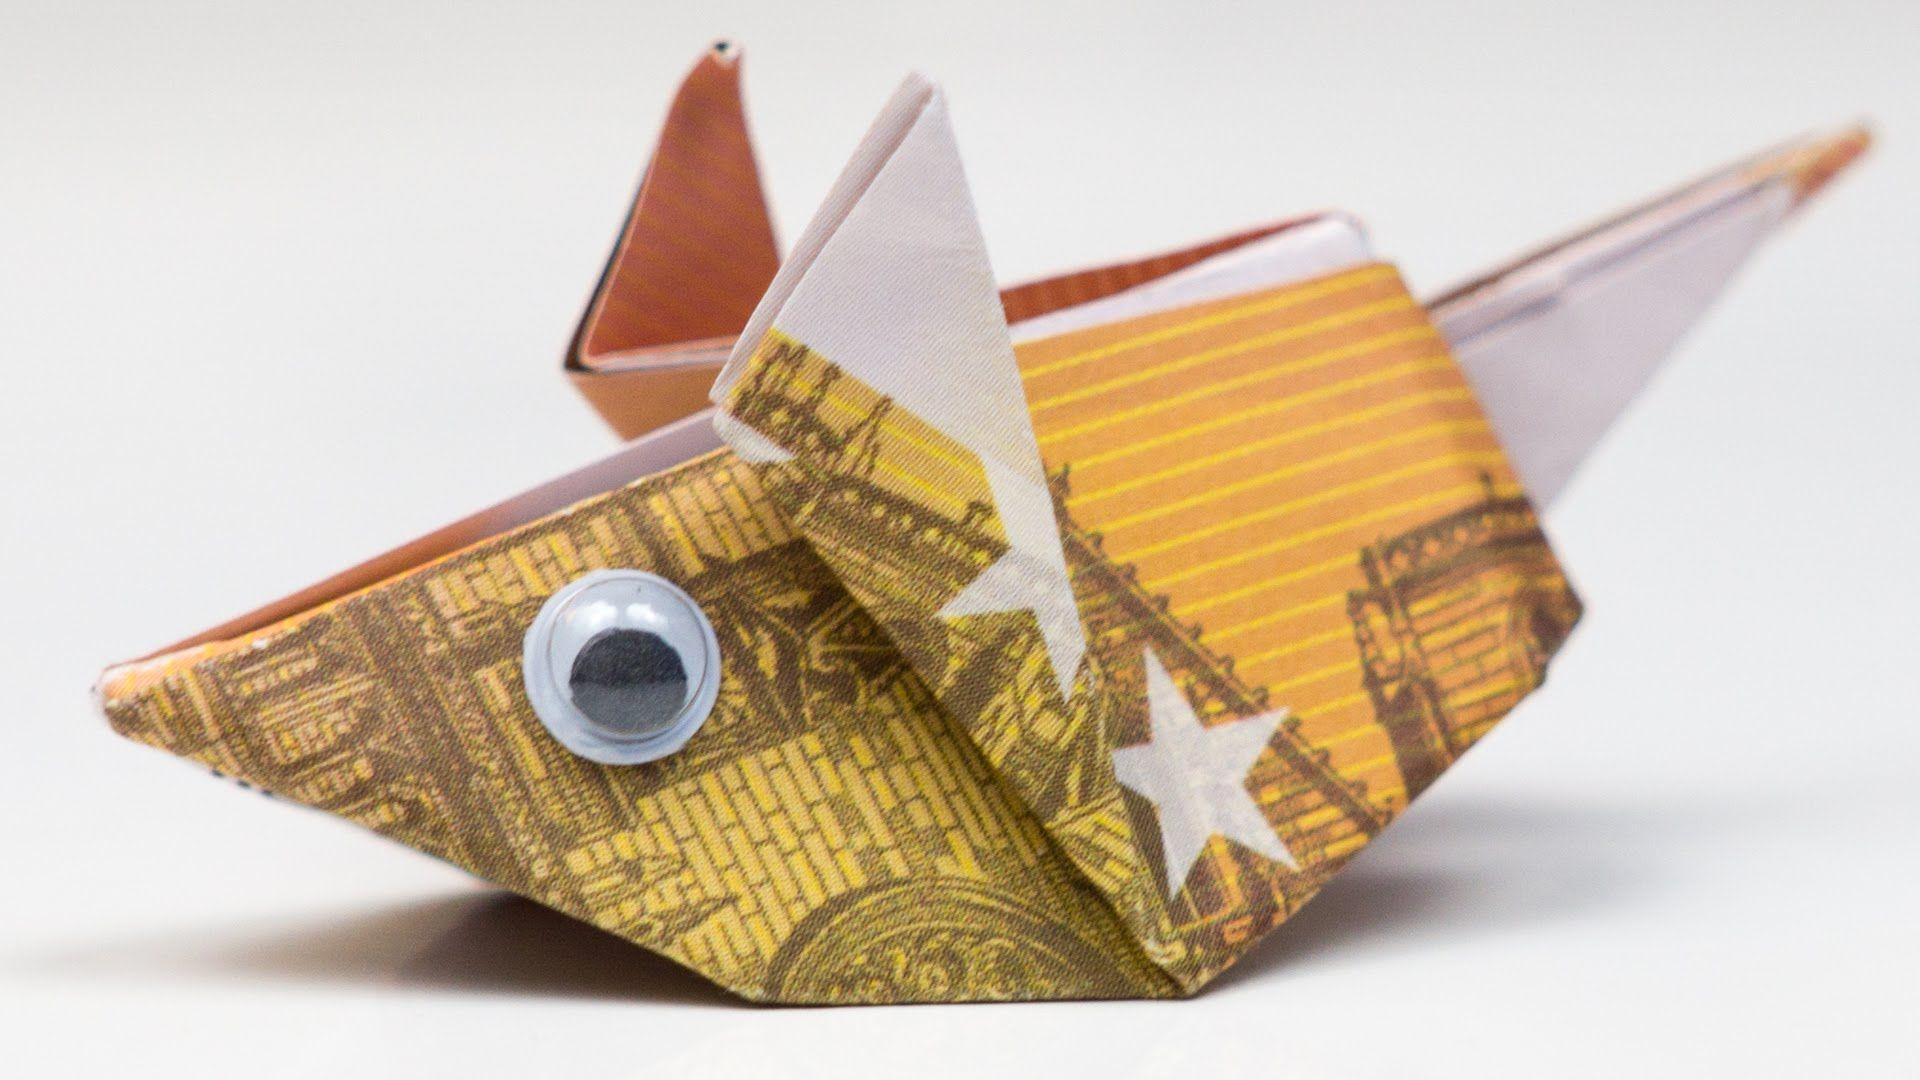 geldgeschenk idee maus falten origami anleitung. Black Bedroom Furniture Sets. Home Design Ideas